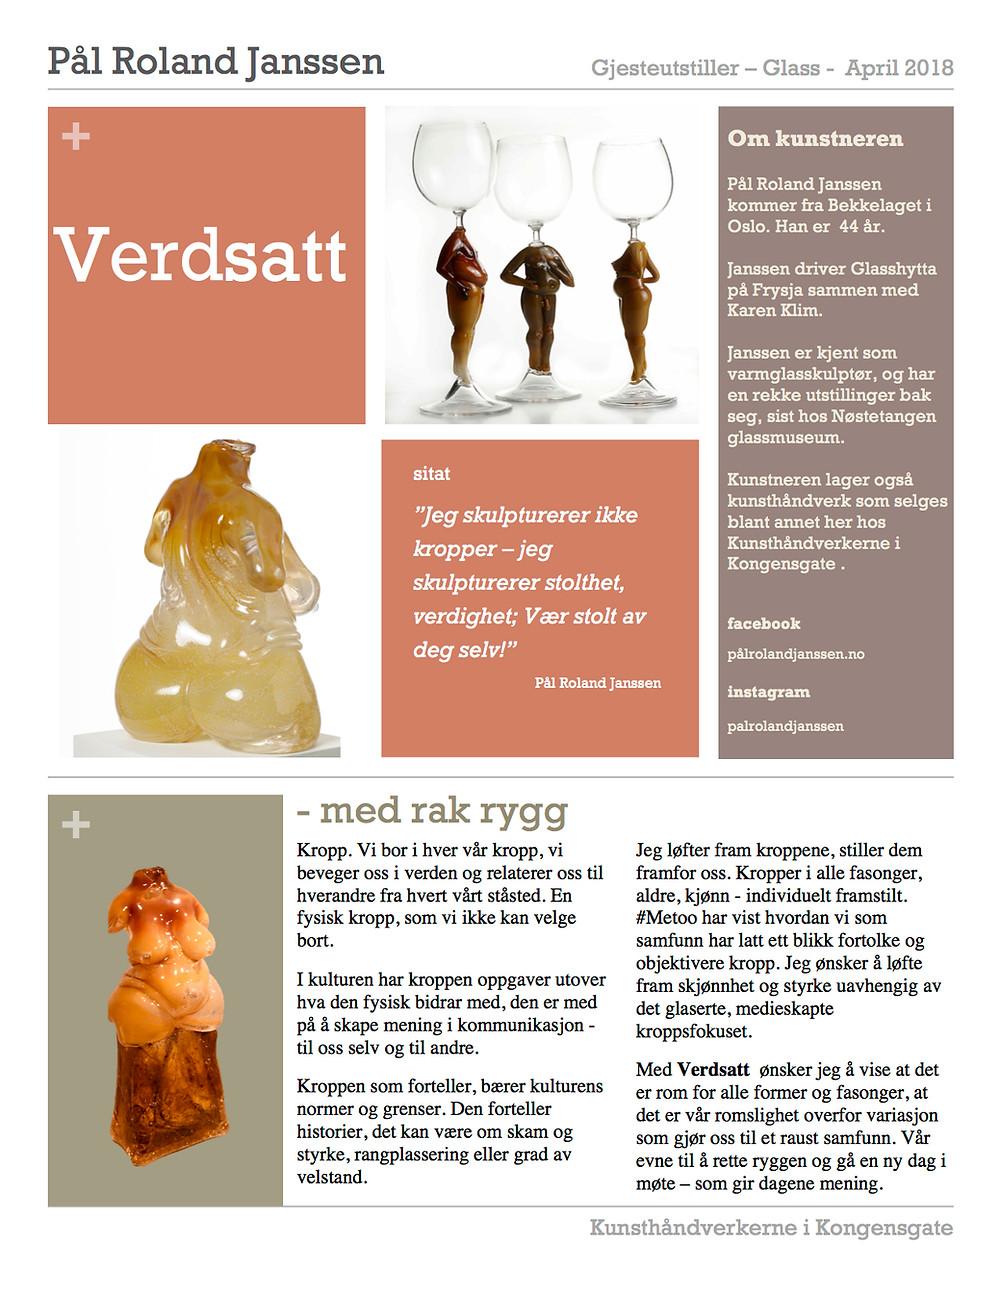 pressemelding glasskunstner pål roland janssen, utstilling hos Kunstnerne i kongensgate